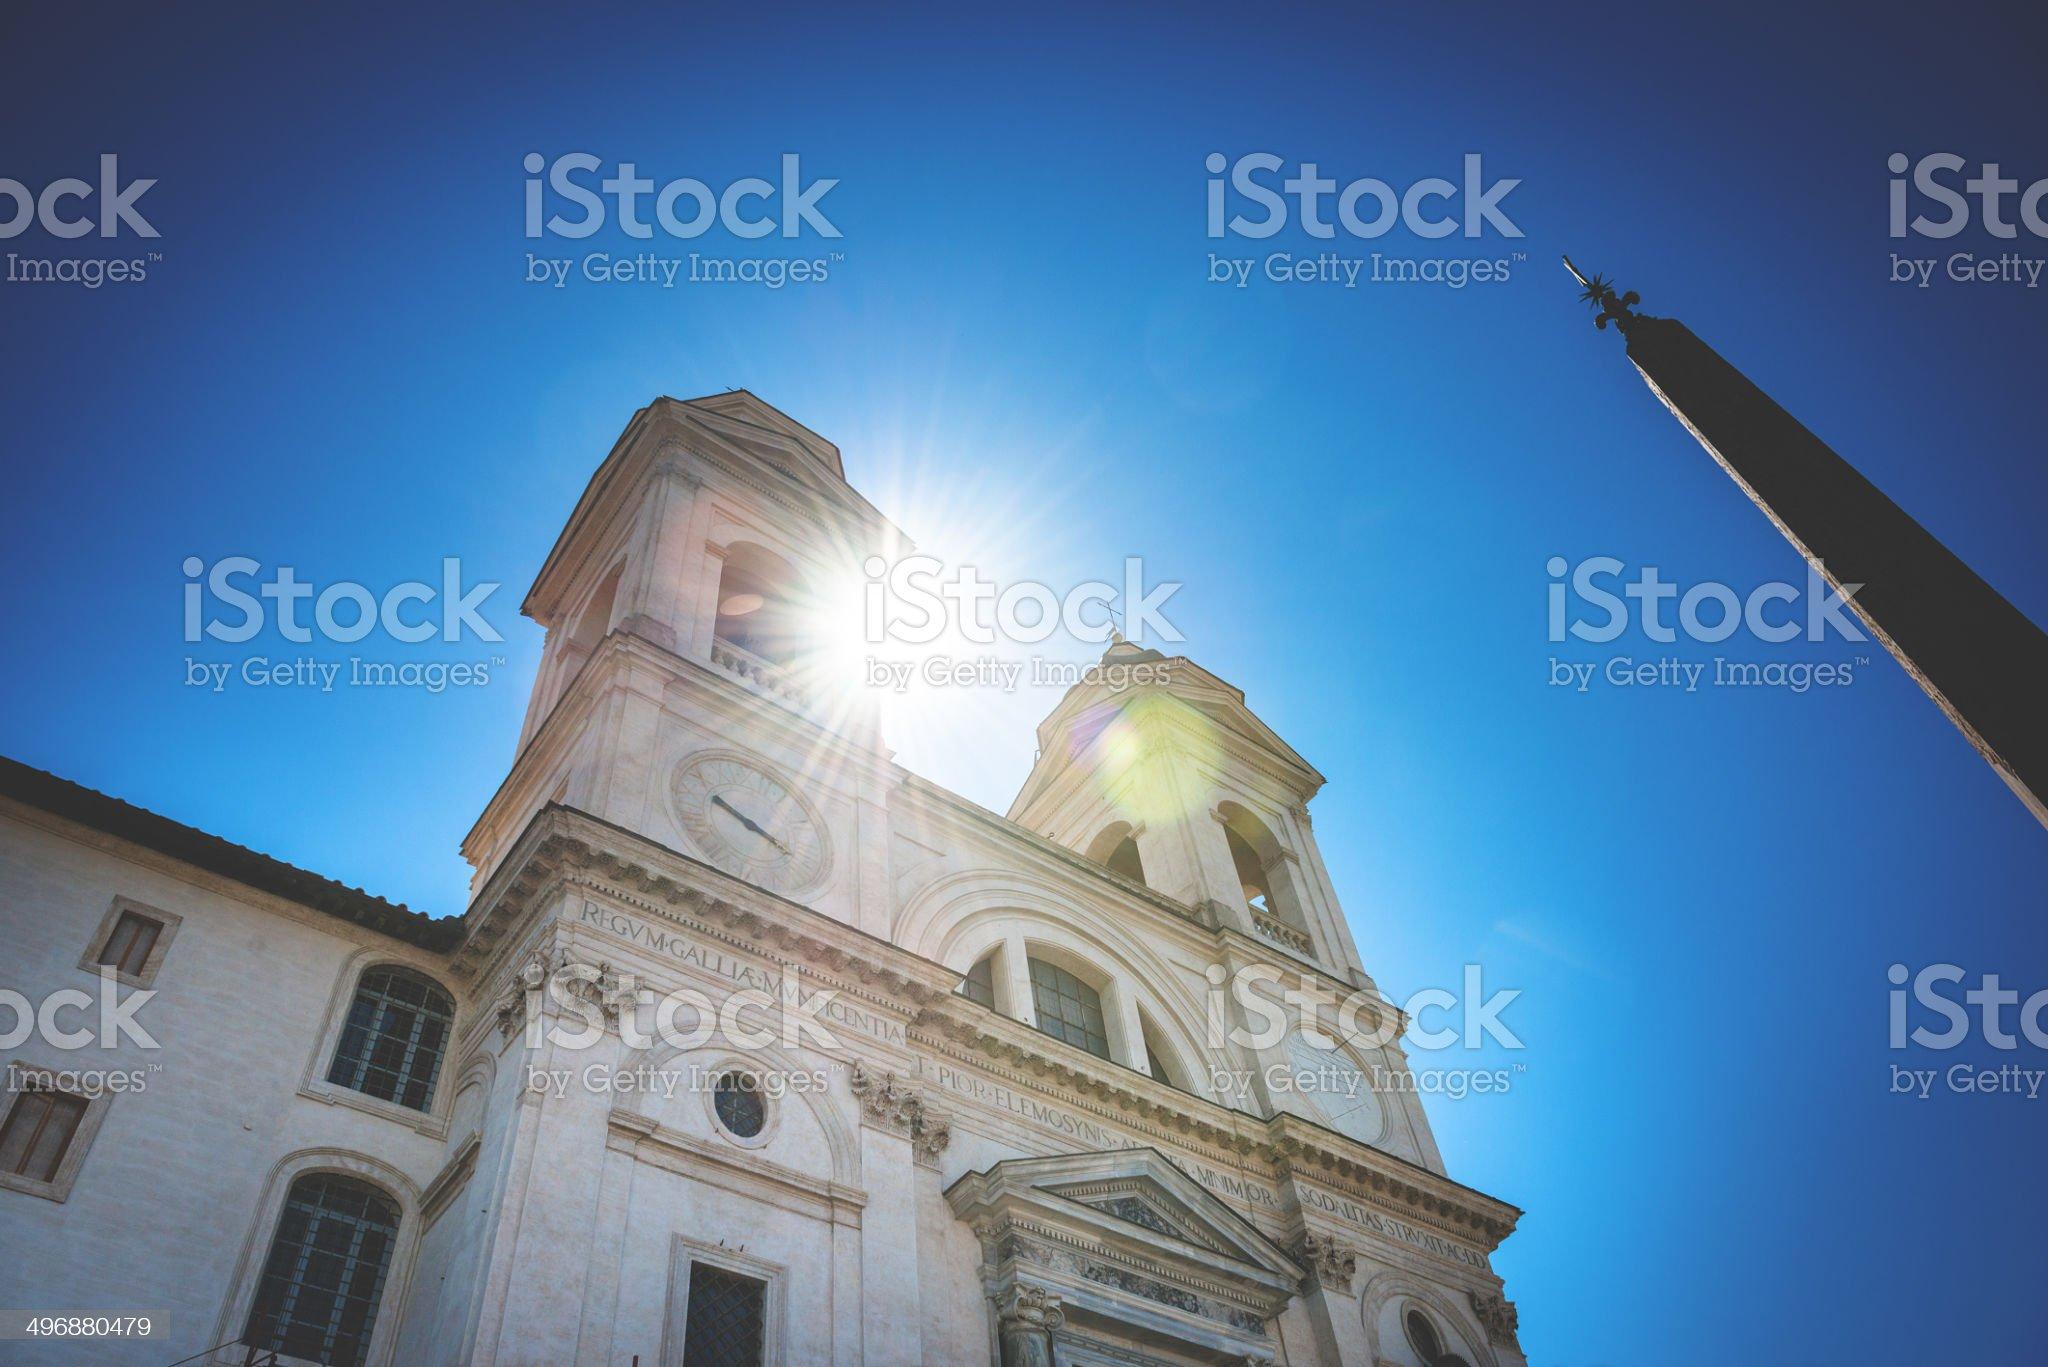 Trinita dei monti church in rome royalty-free stock photo